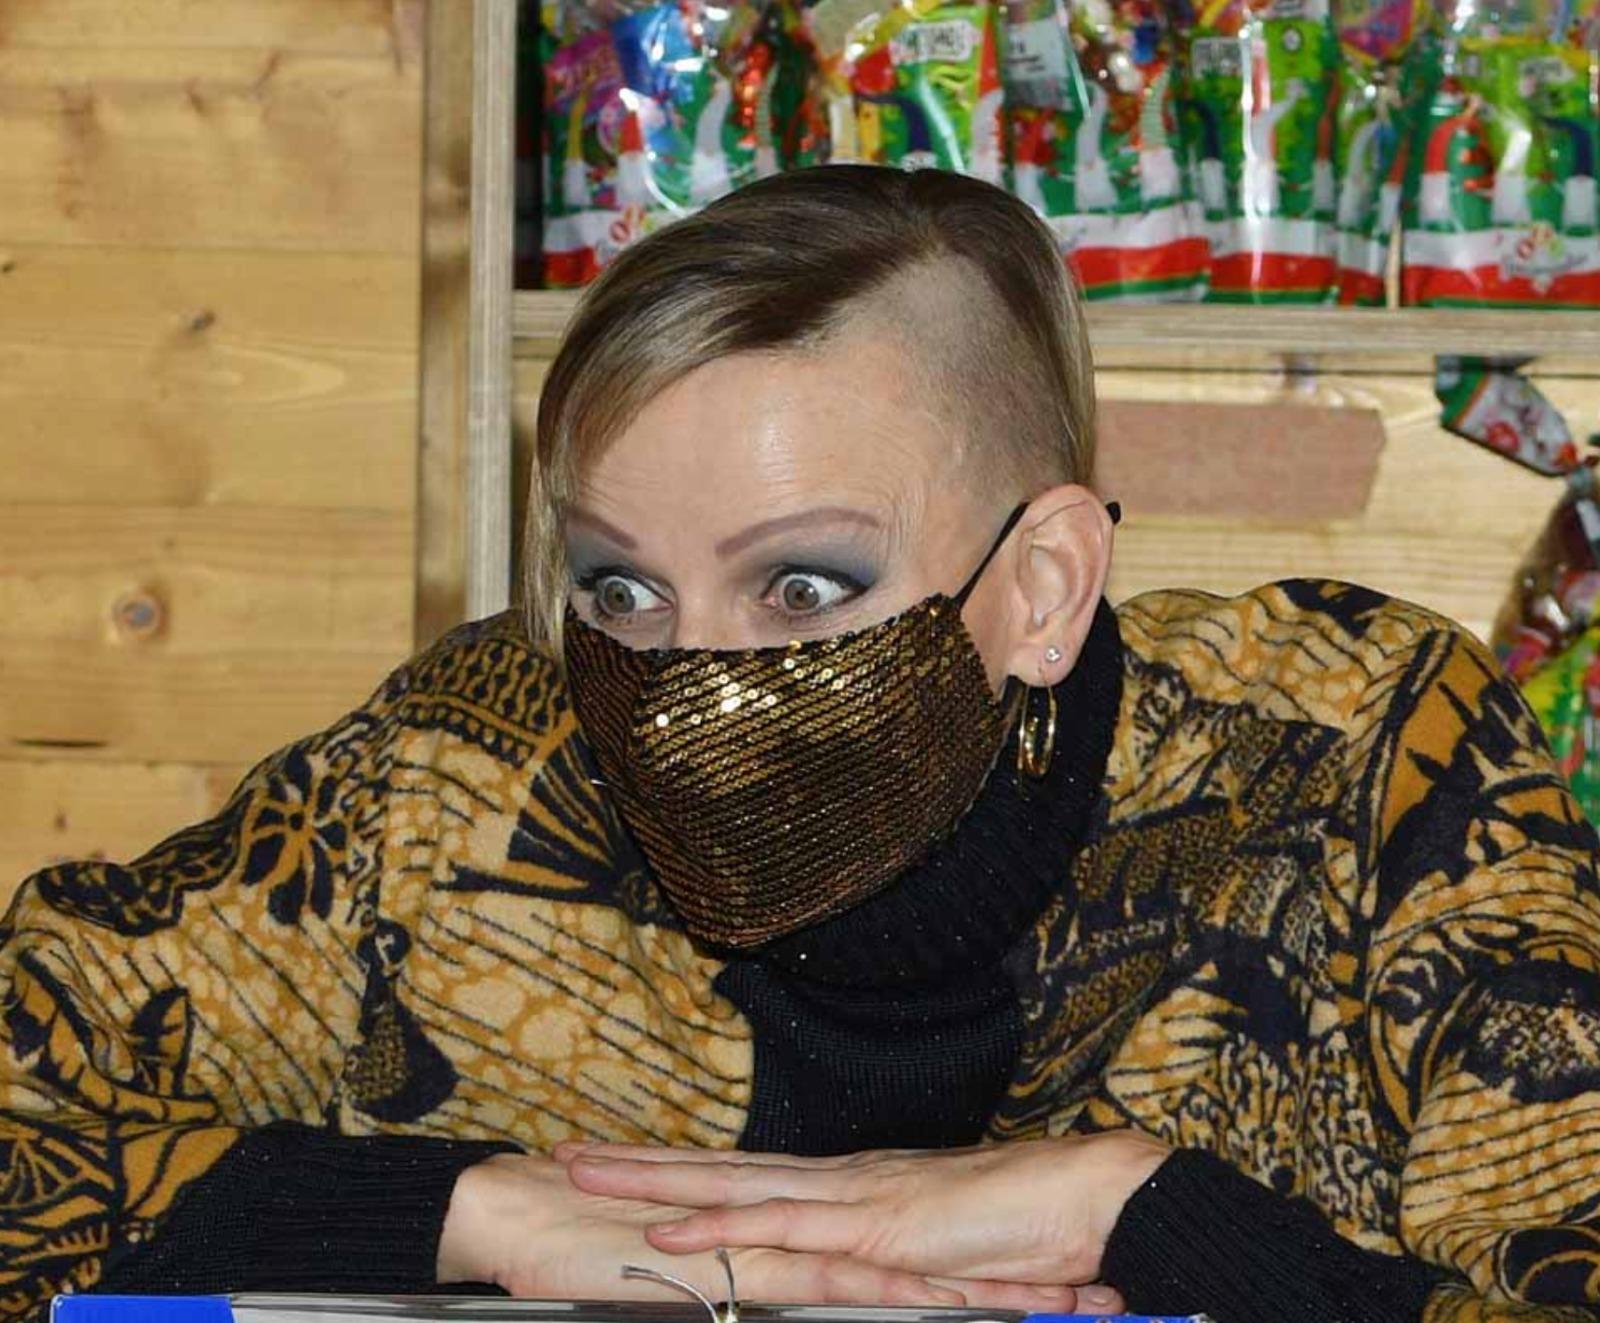 charlene wittstock monaco taaglio capelli rasati look